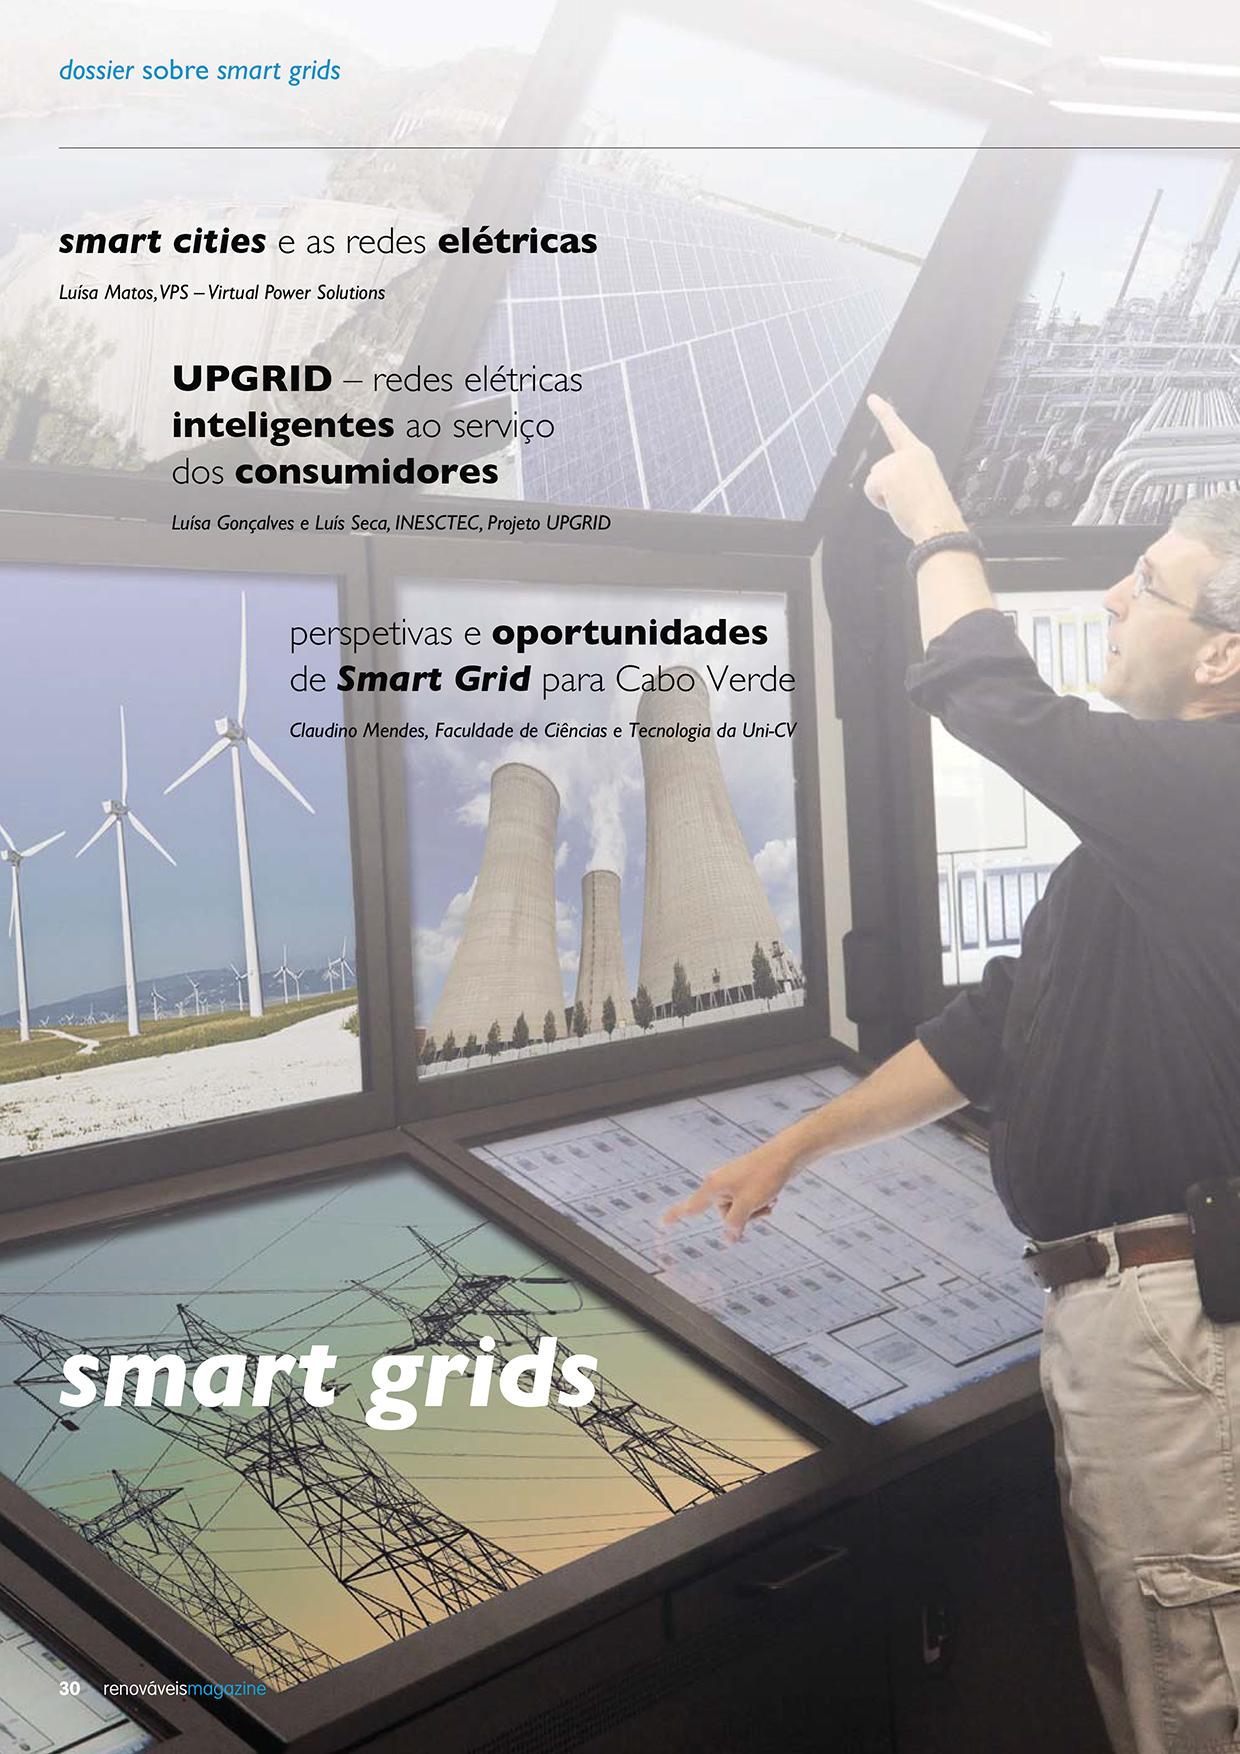 Dossier sobre Smart grids